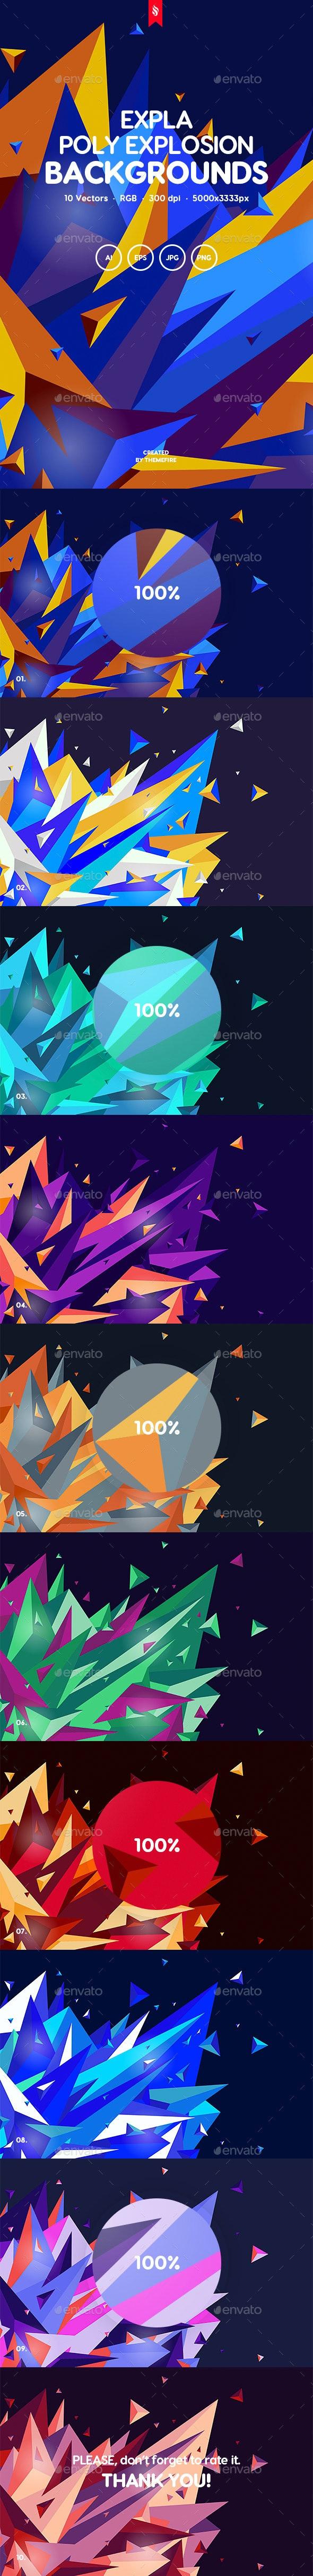 Expla - Polygonal Explosion Backgrounds - Miscellaneous Backgrounds